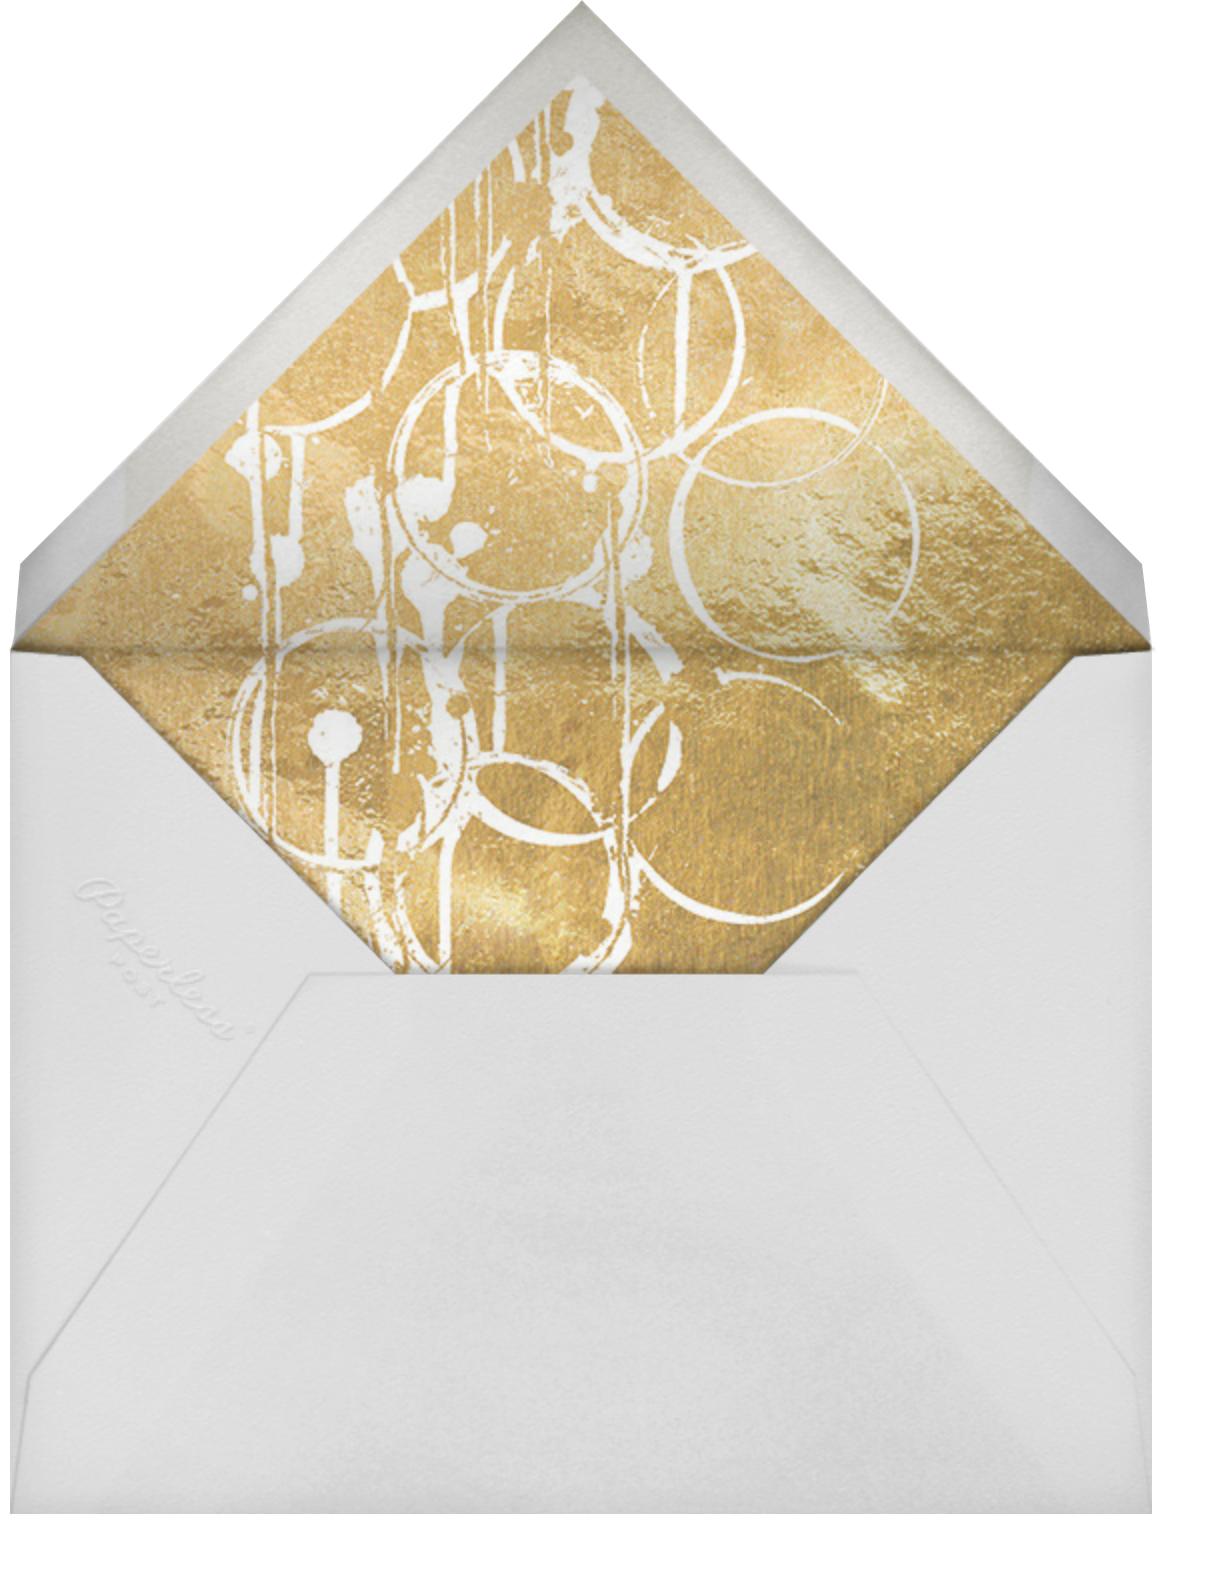 Bottle Shock - Gold - Kelly Wearstler - Viewing party - envelope back